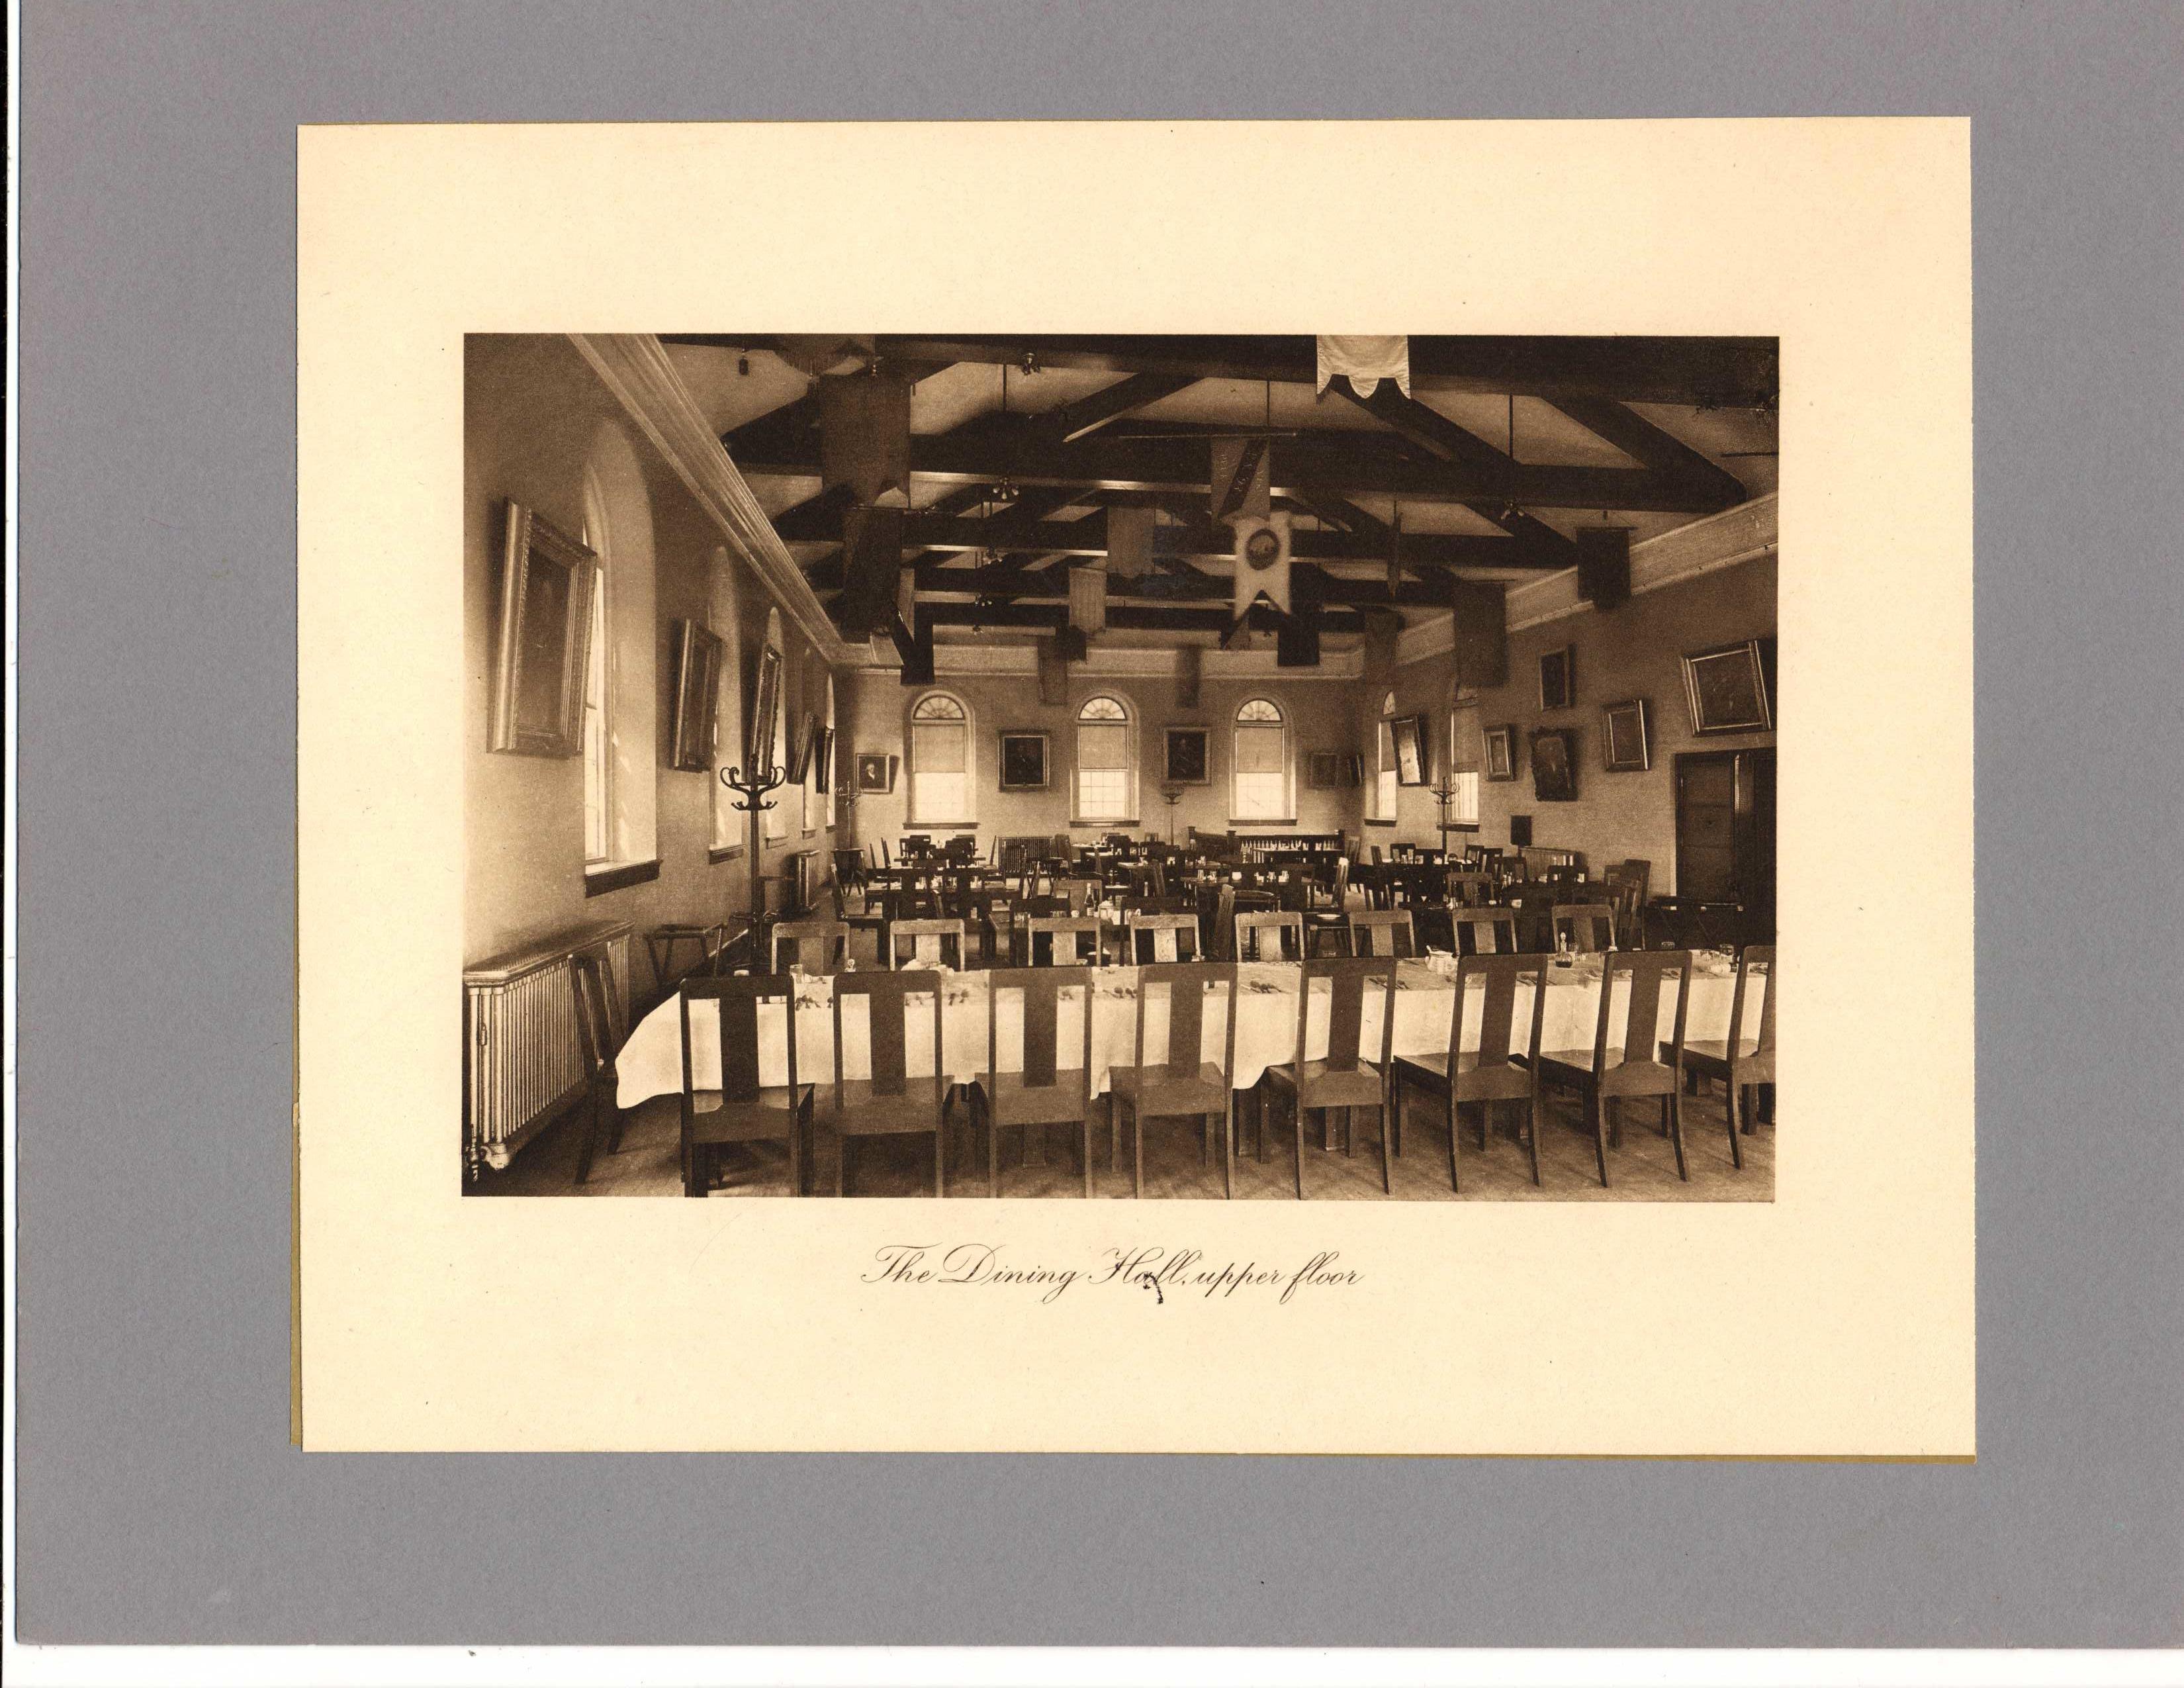 Bulfinch Hall, dining room, second floor